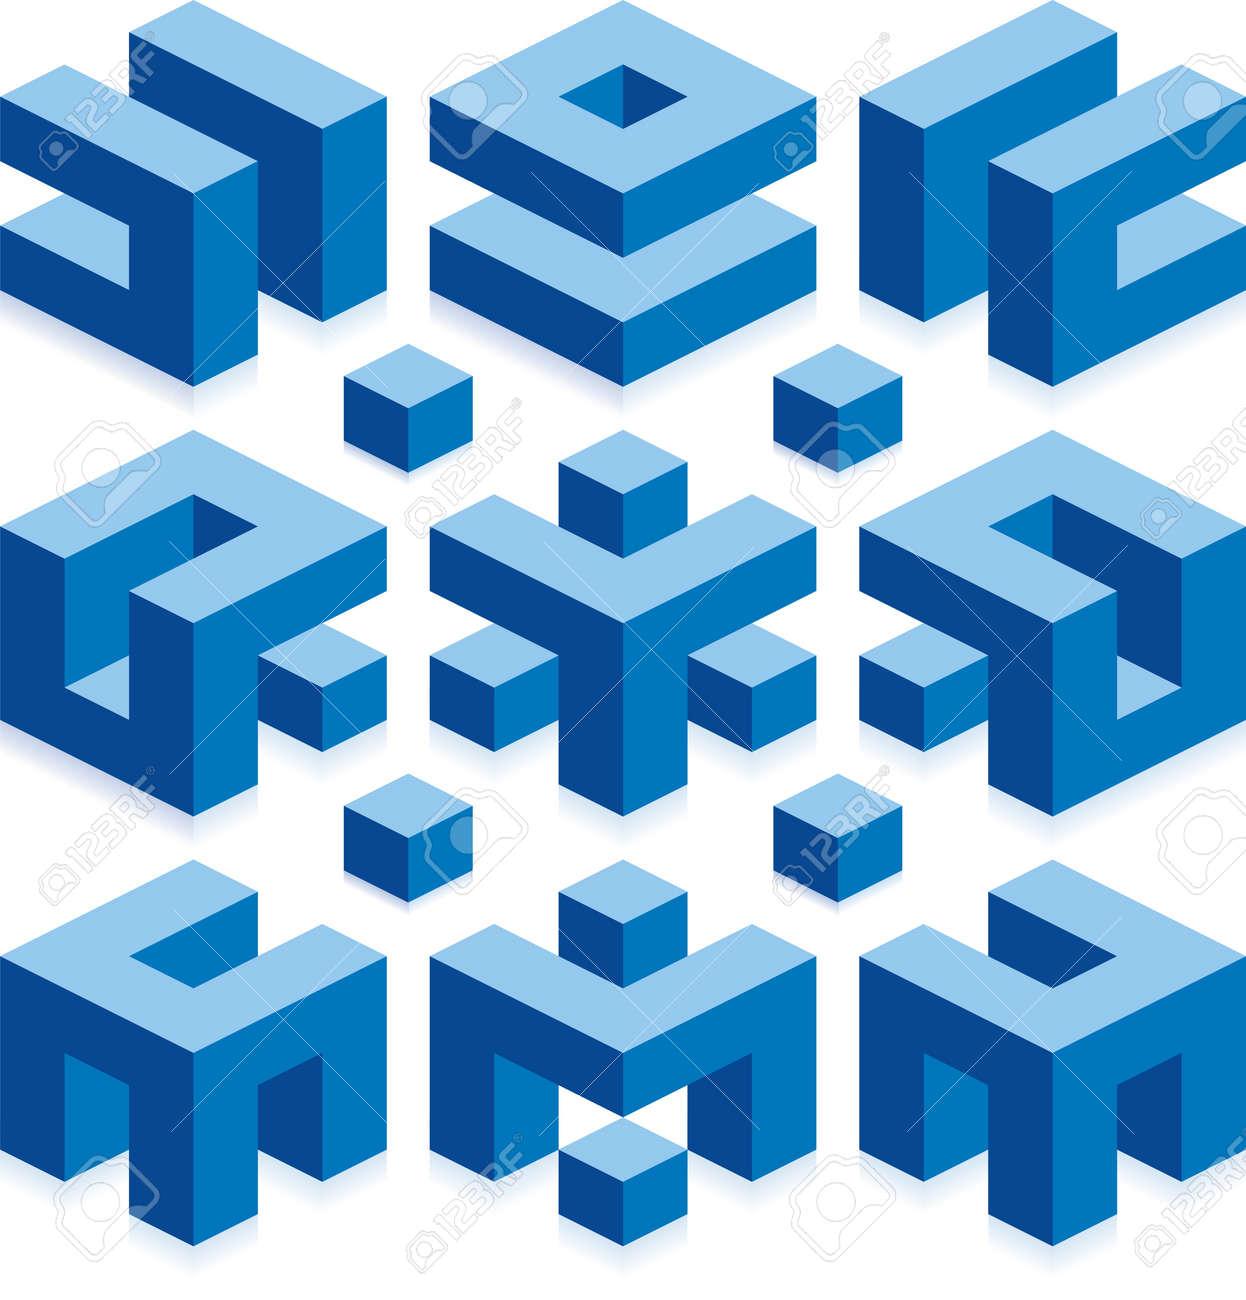 Cube Logo Elements for Construction Business Standard-Bild - 18506740